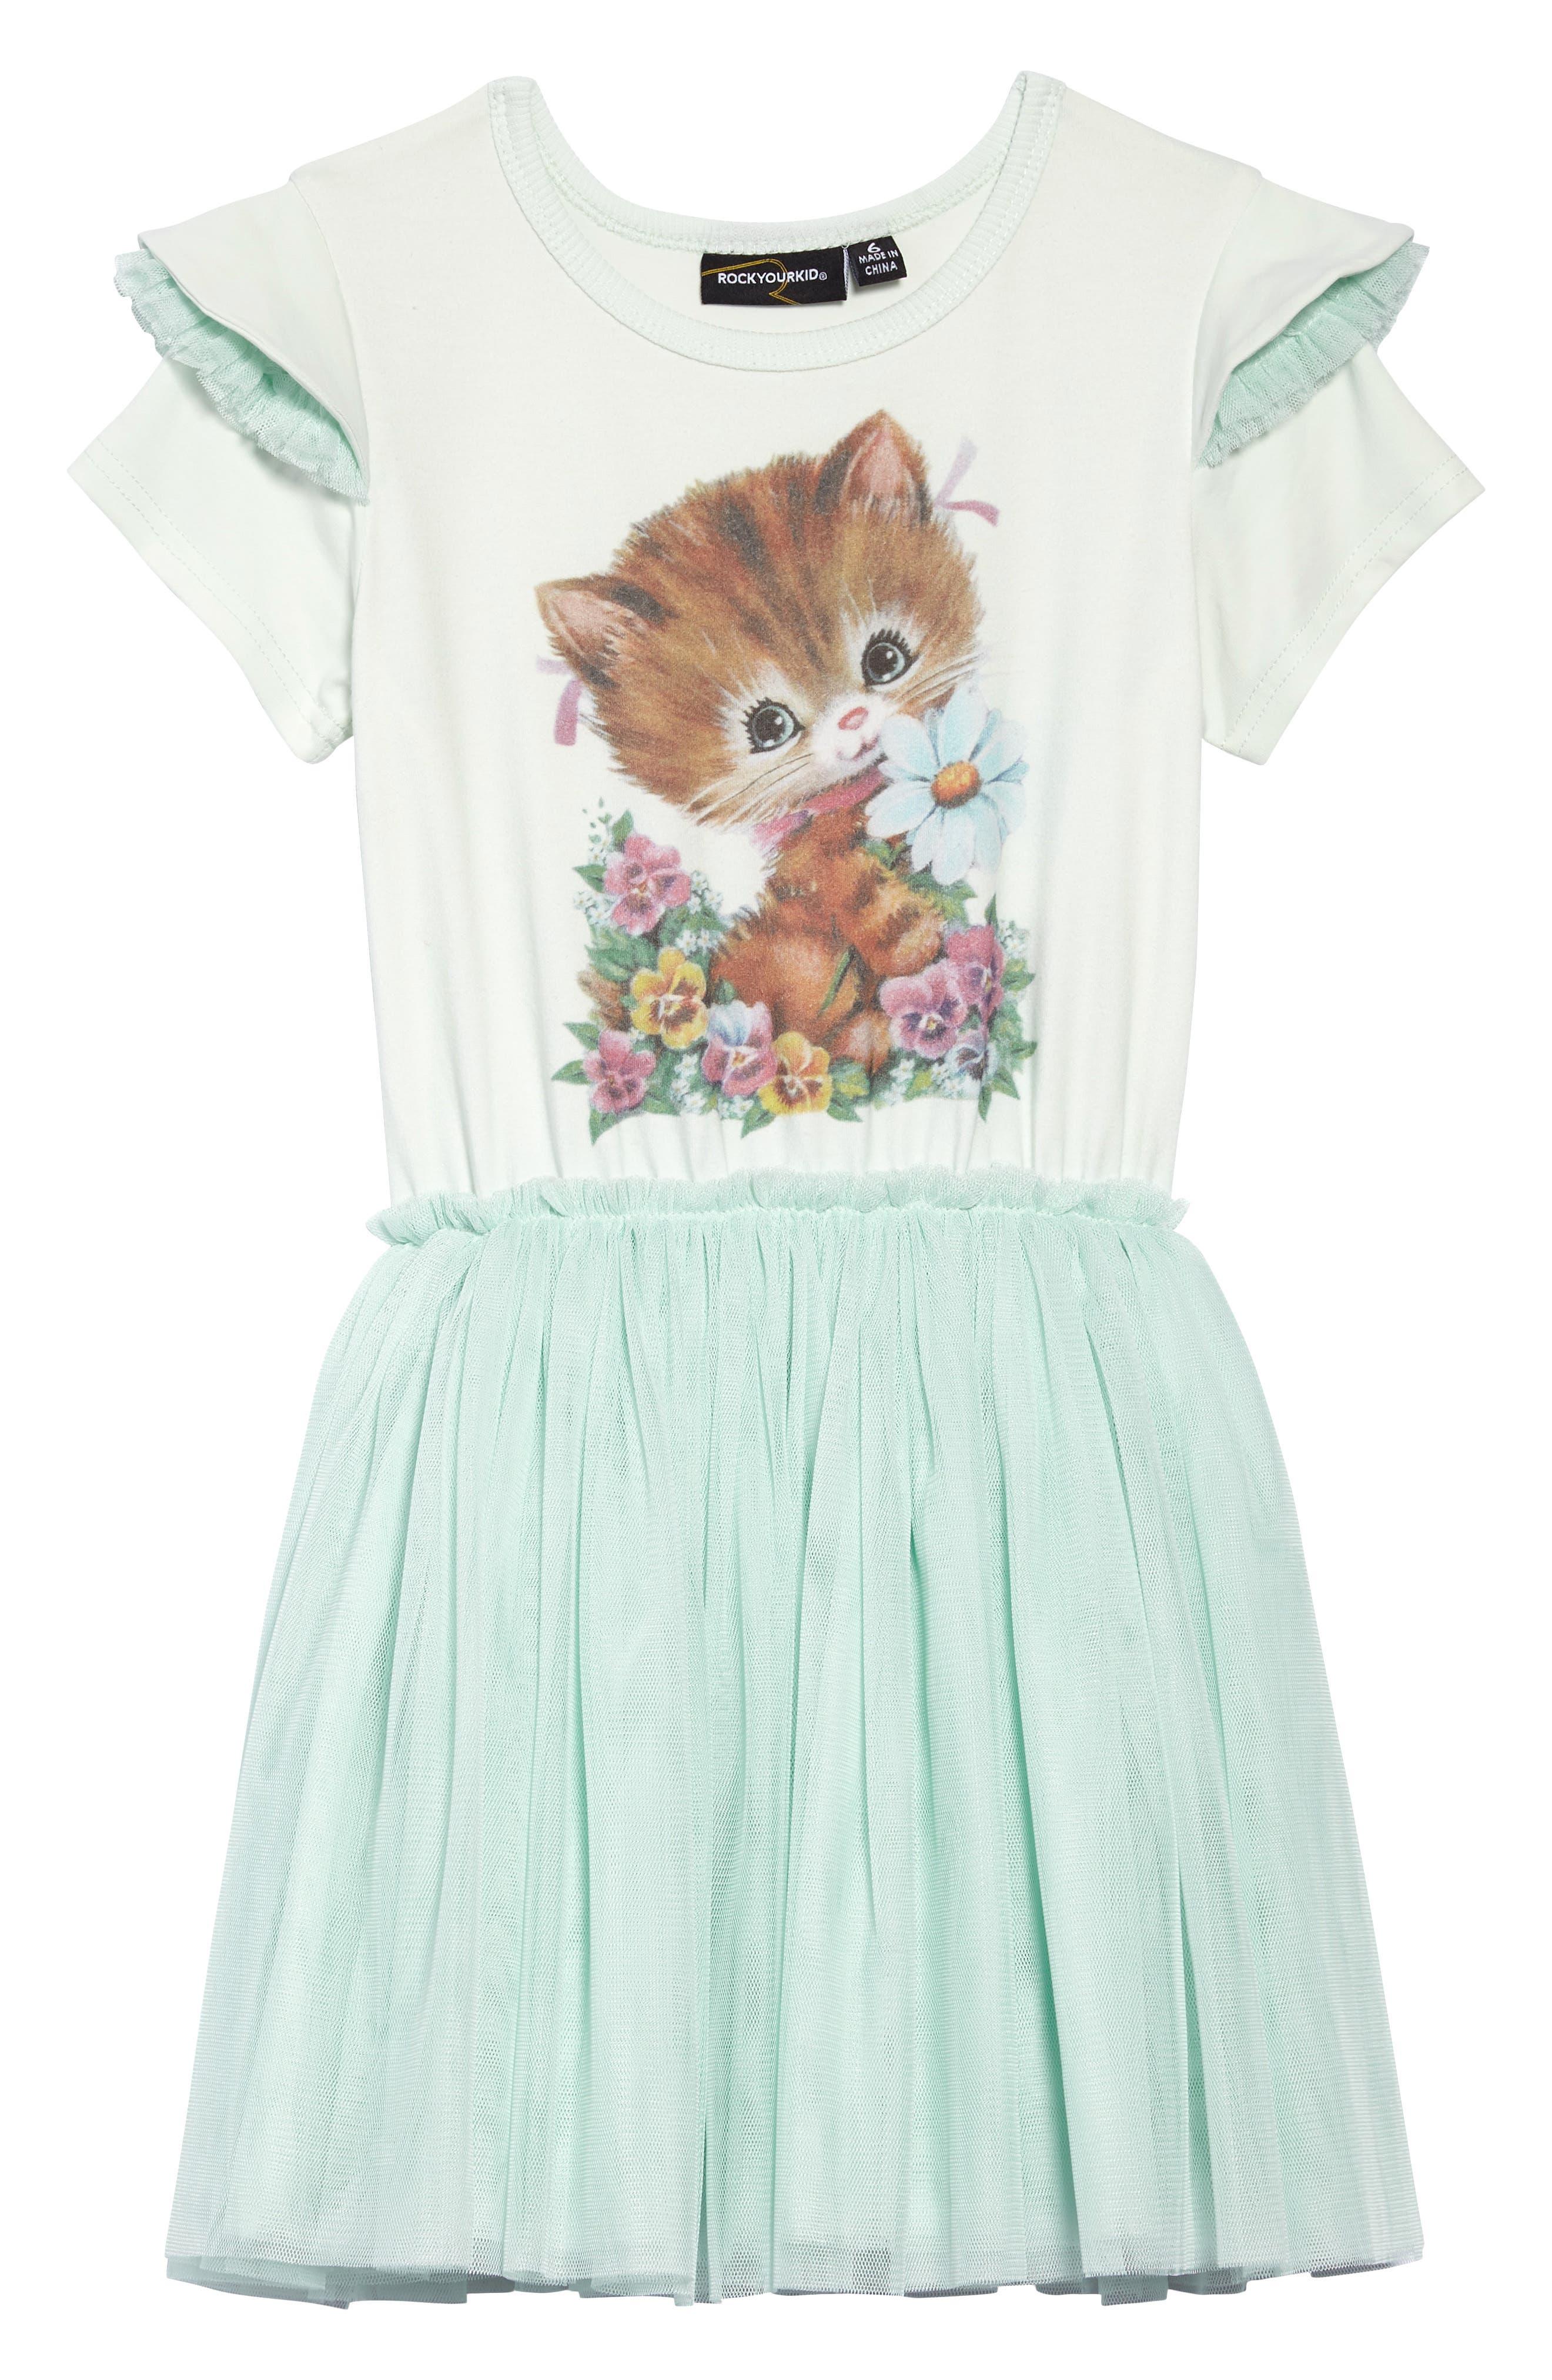 Kitty Kat Circus Dress,                             Main thumbnail 1, color,                             Teal